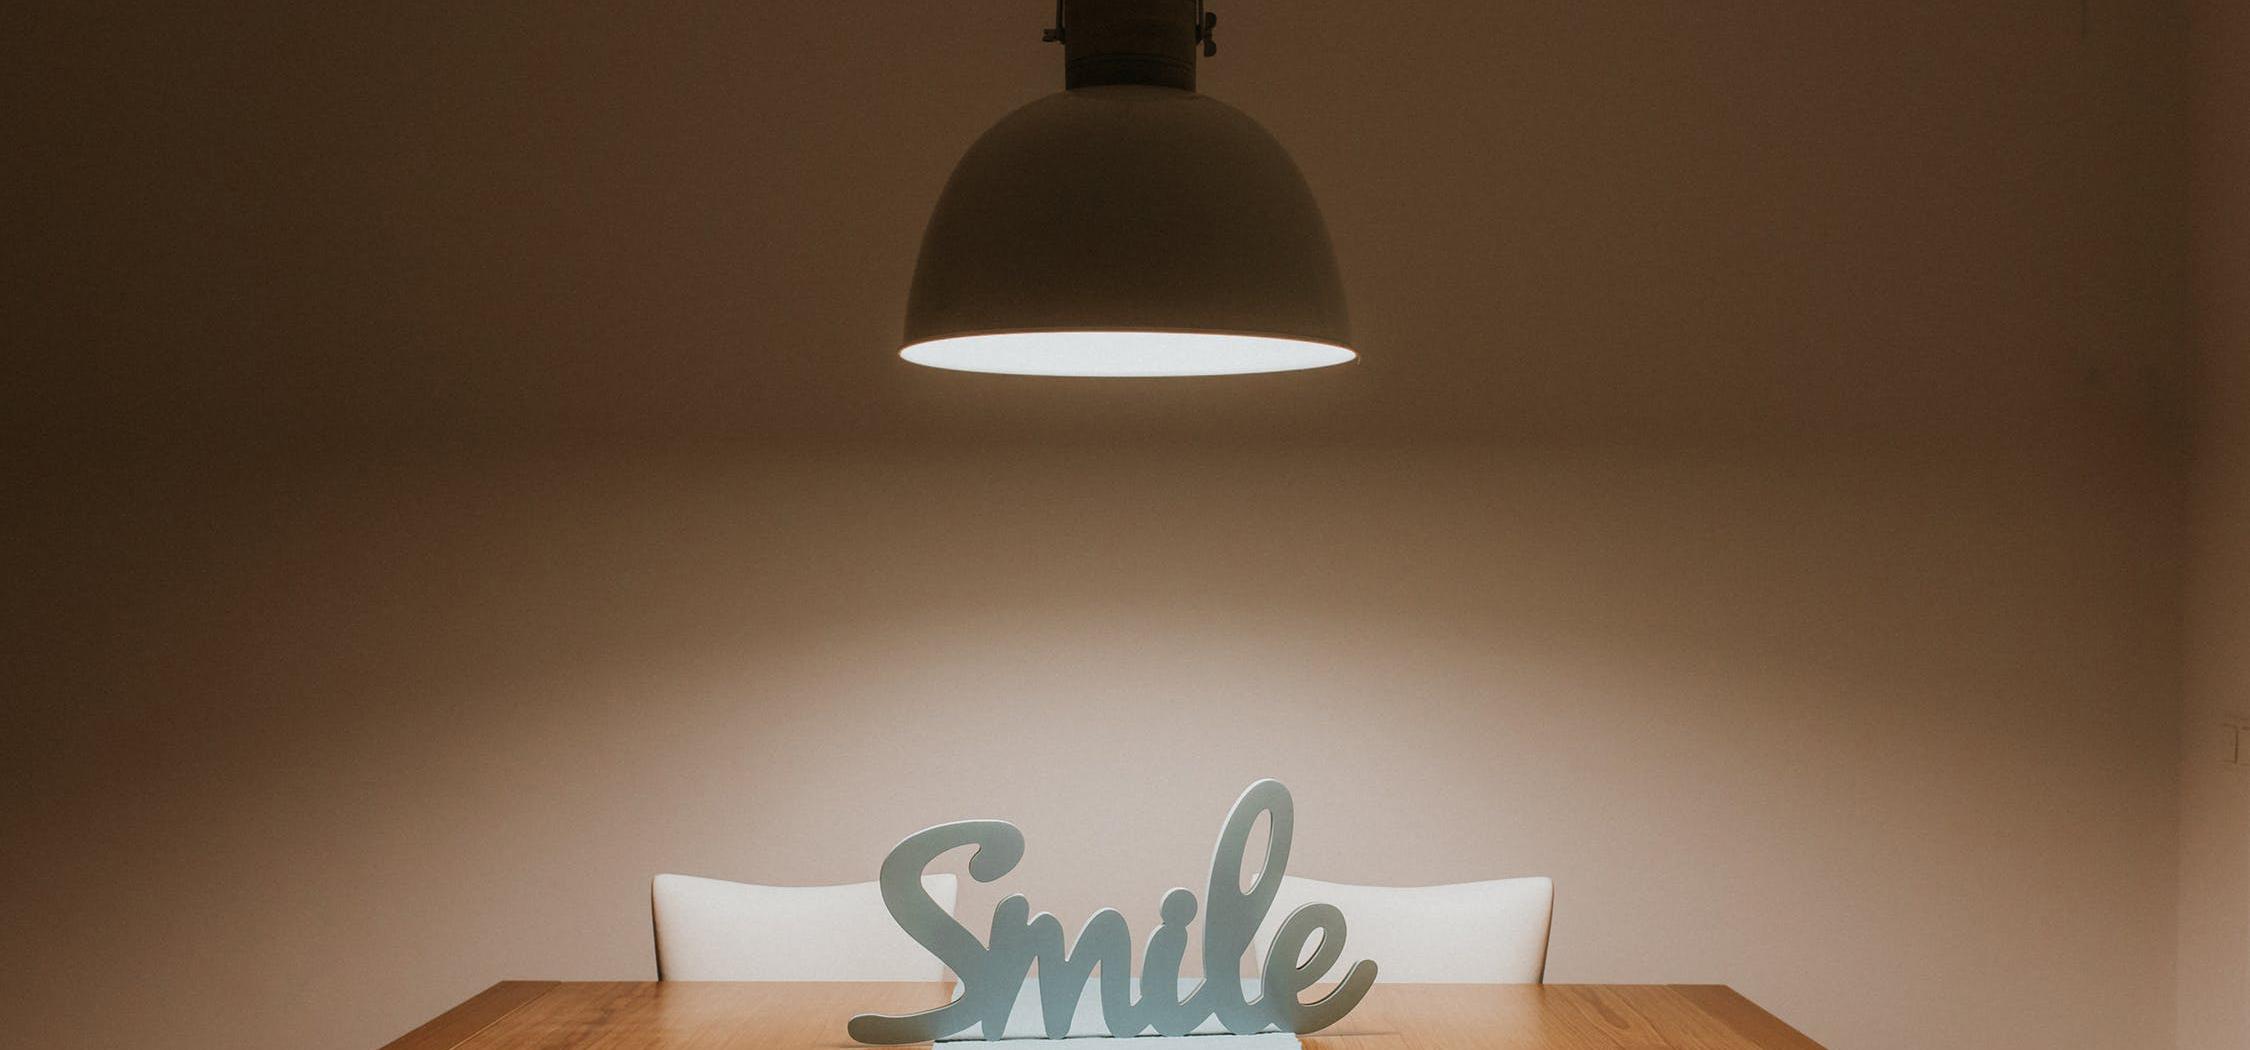 best-lighting-features-to-lighten-up-your-home-9.jpeg